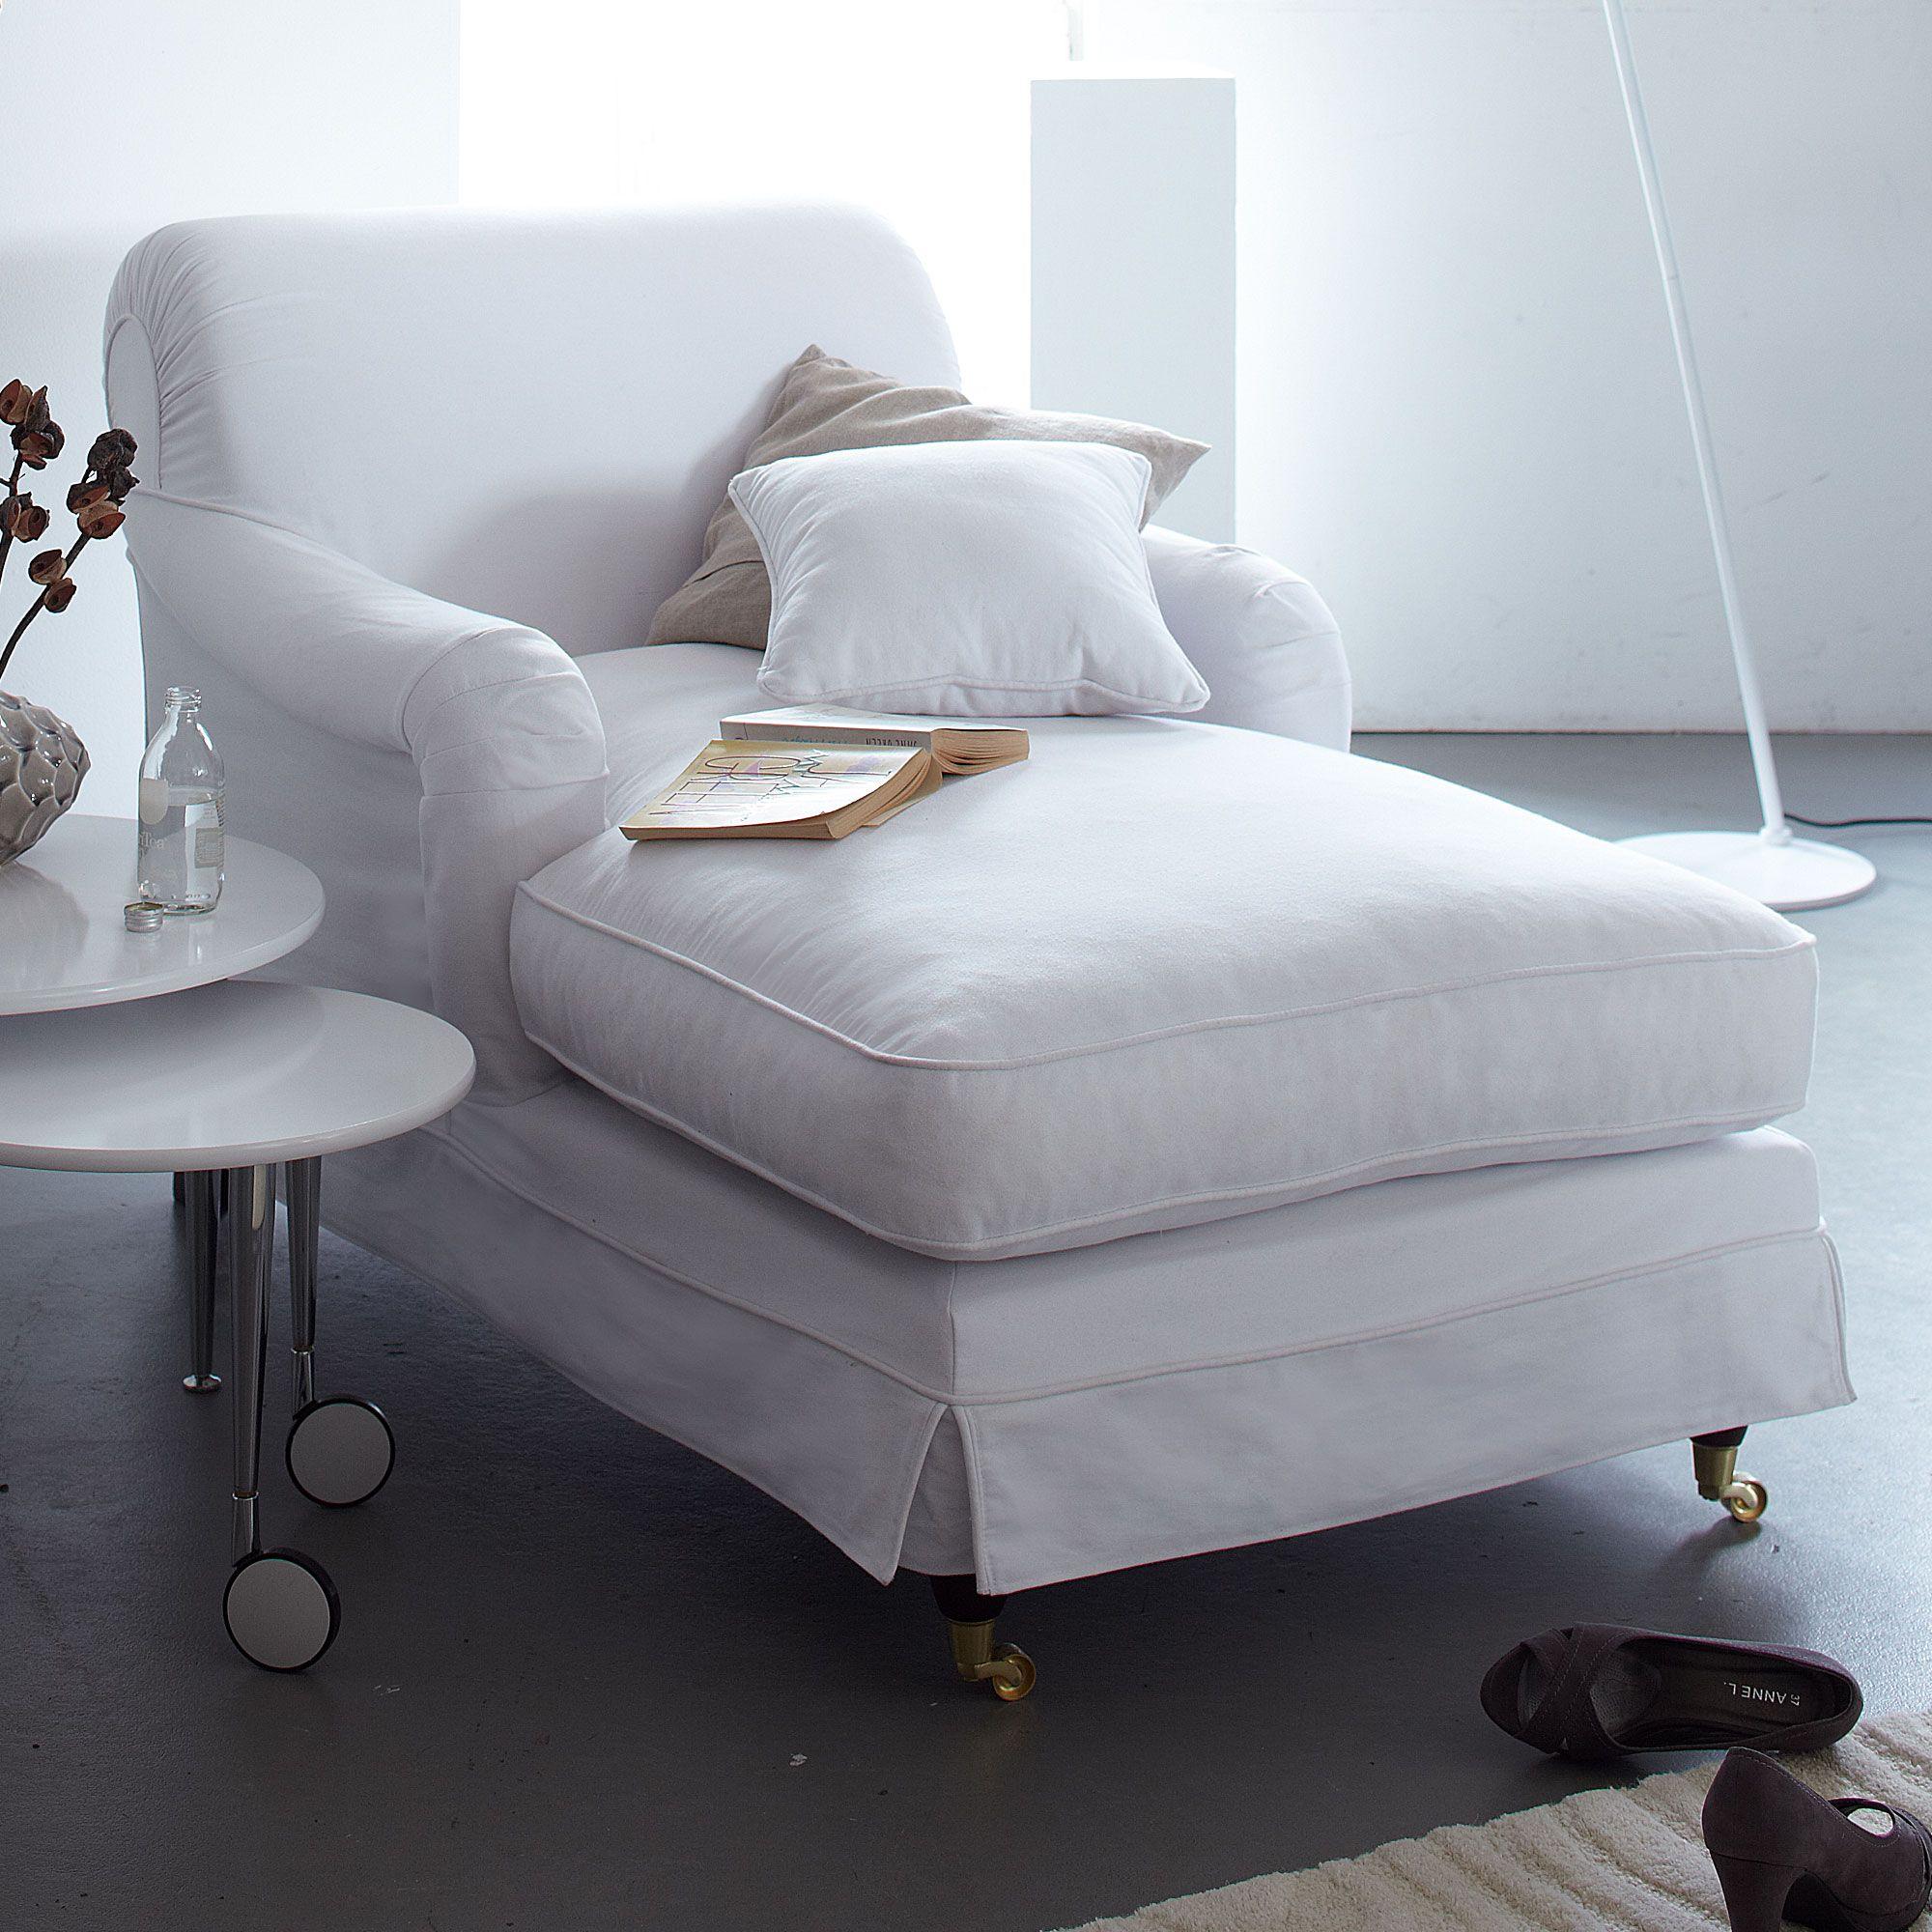 Longchair im Impressionen Online Shop...soooo want this